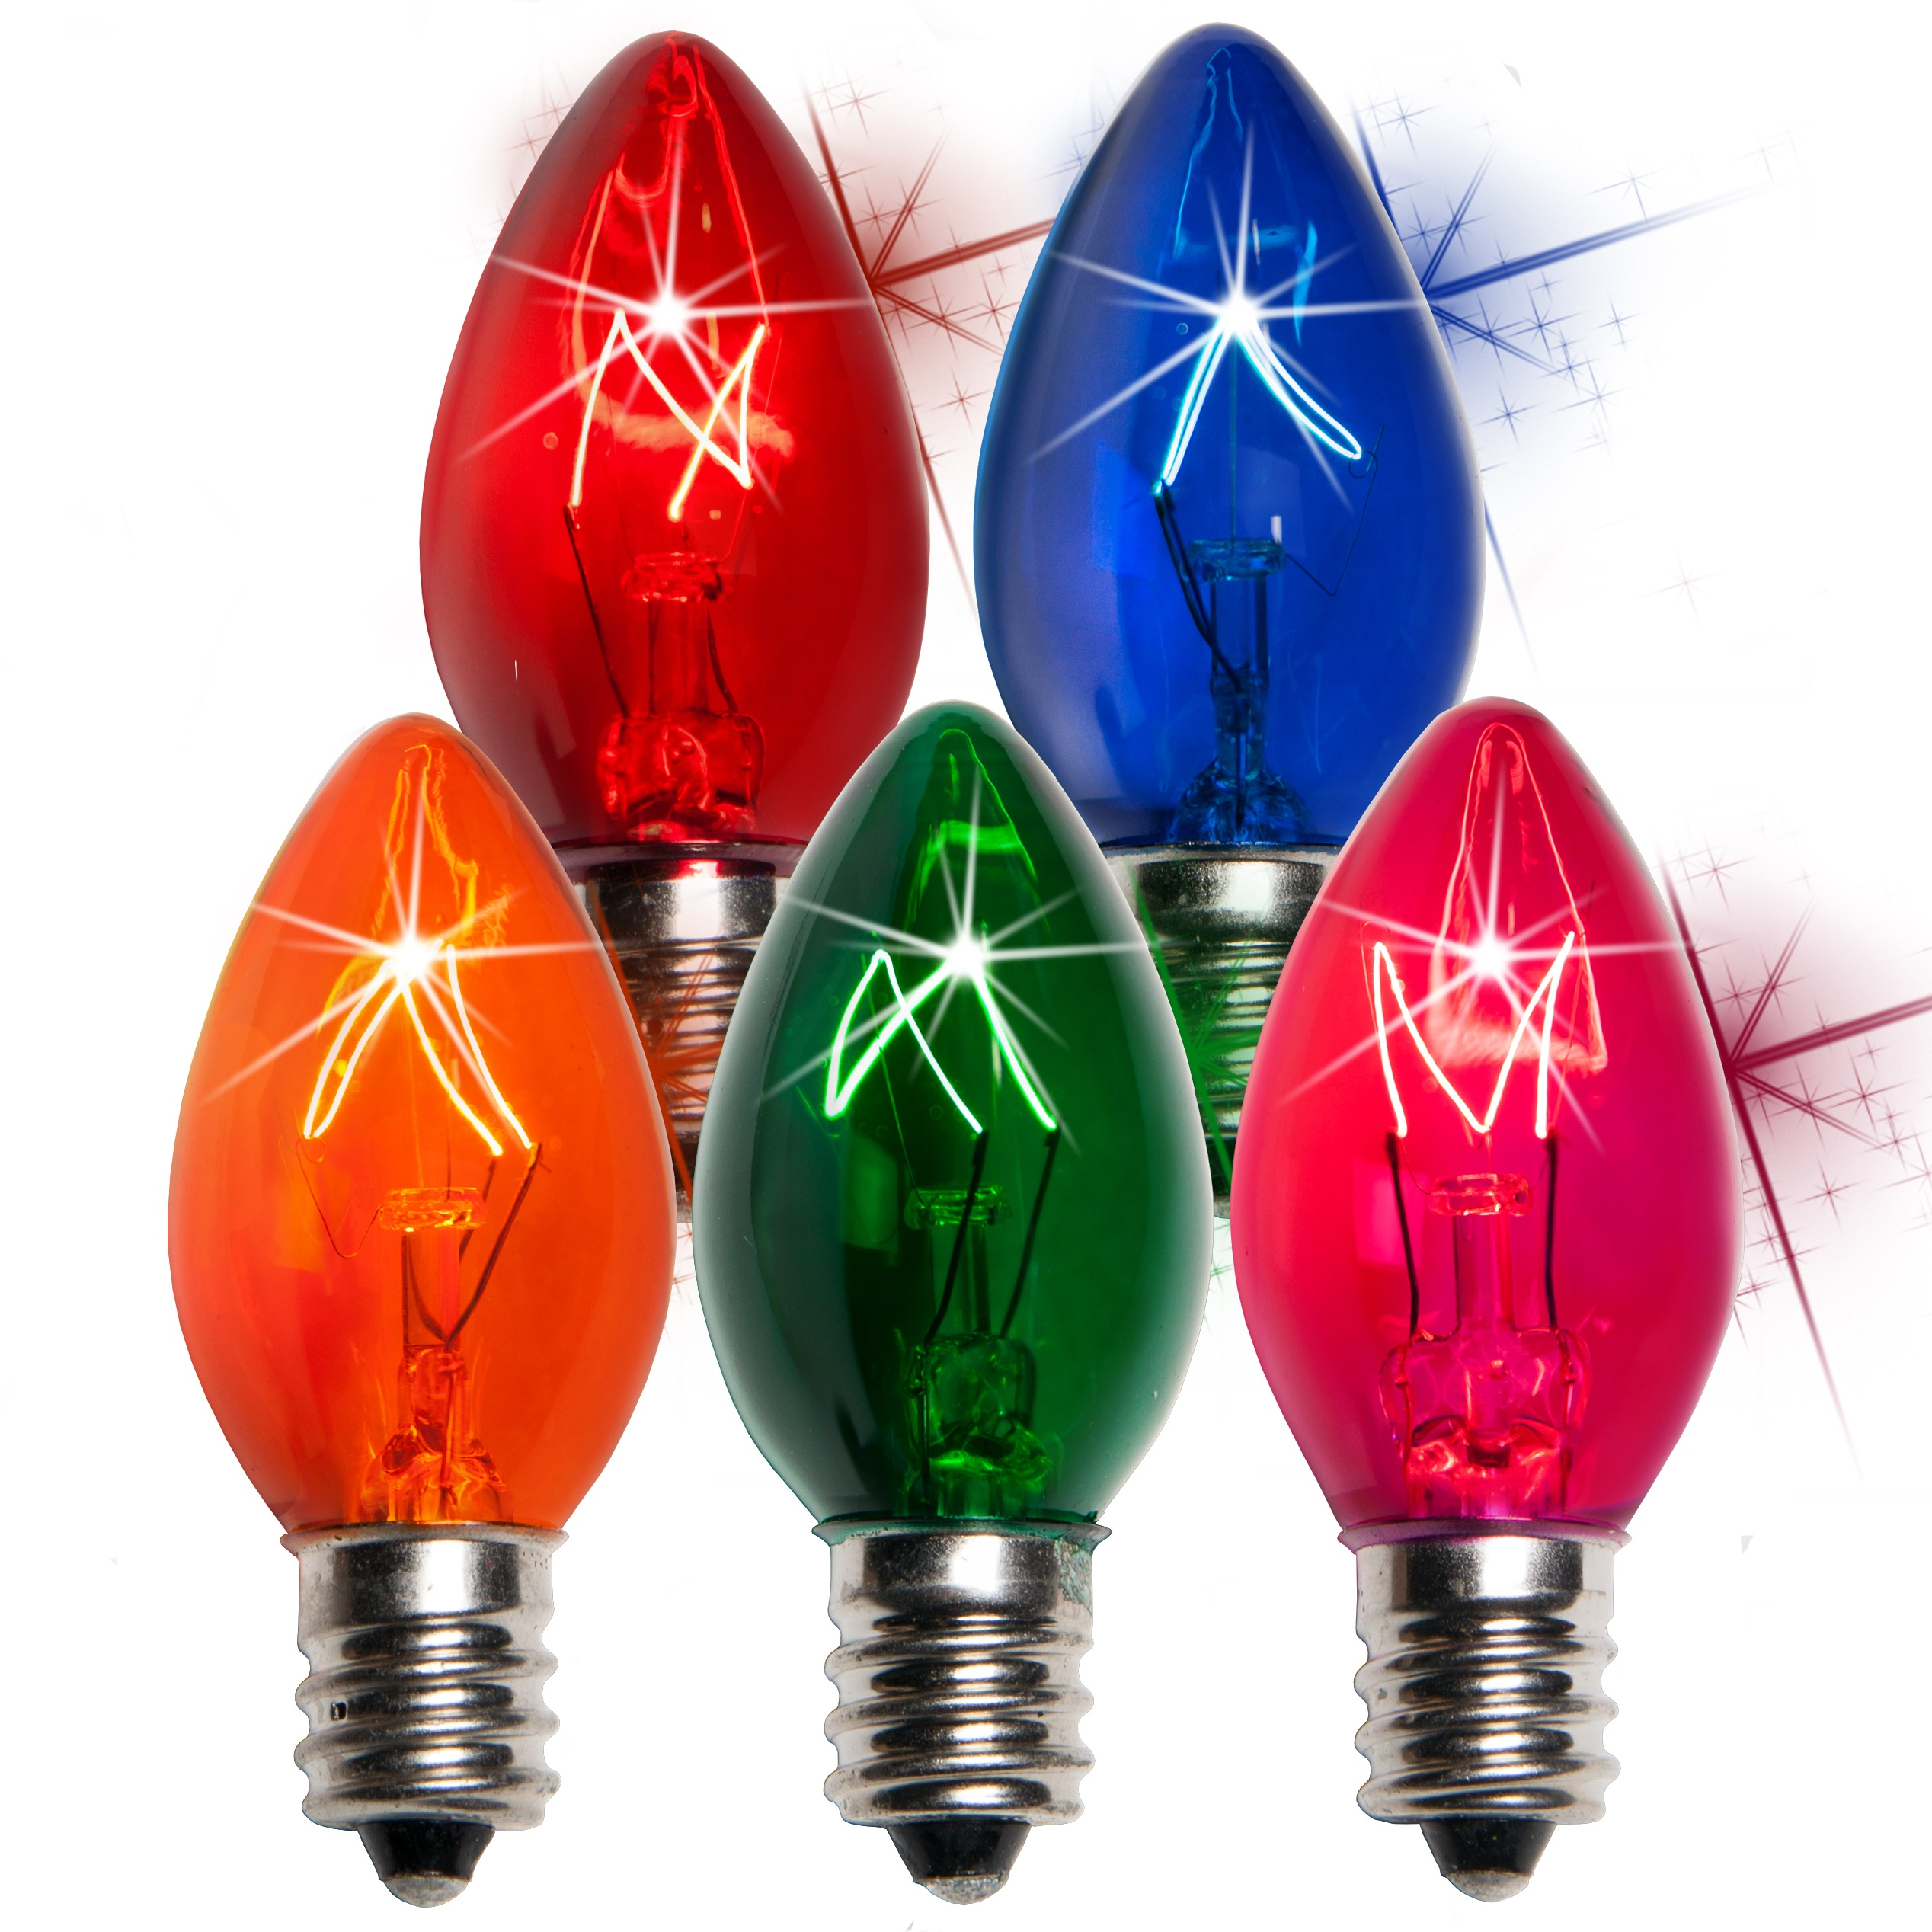 C7 Christmas Light Bulb - C7 Twinkle Multicolor Christmas Light ...